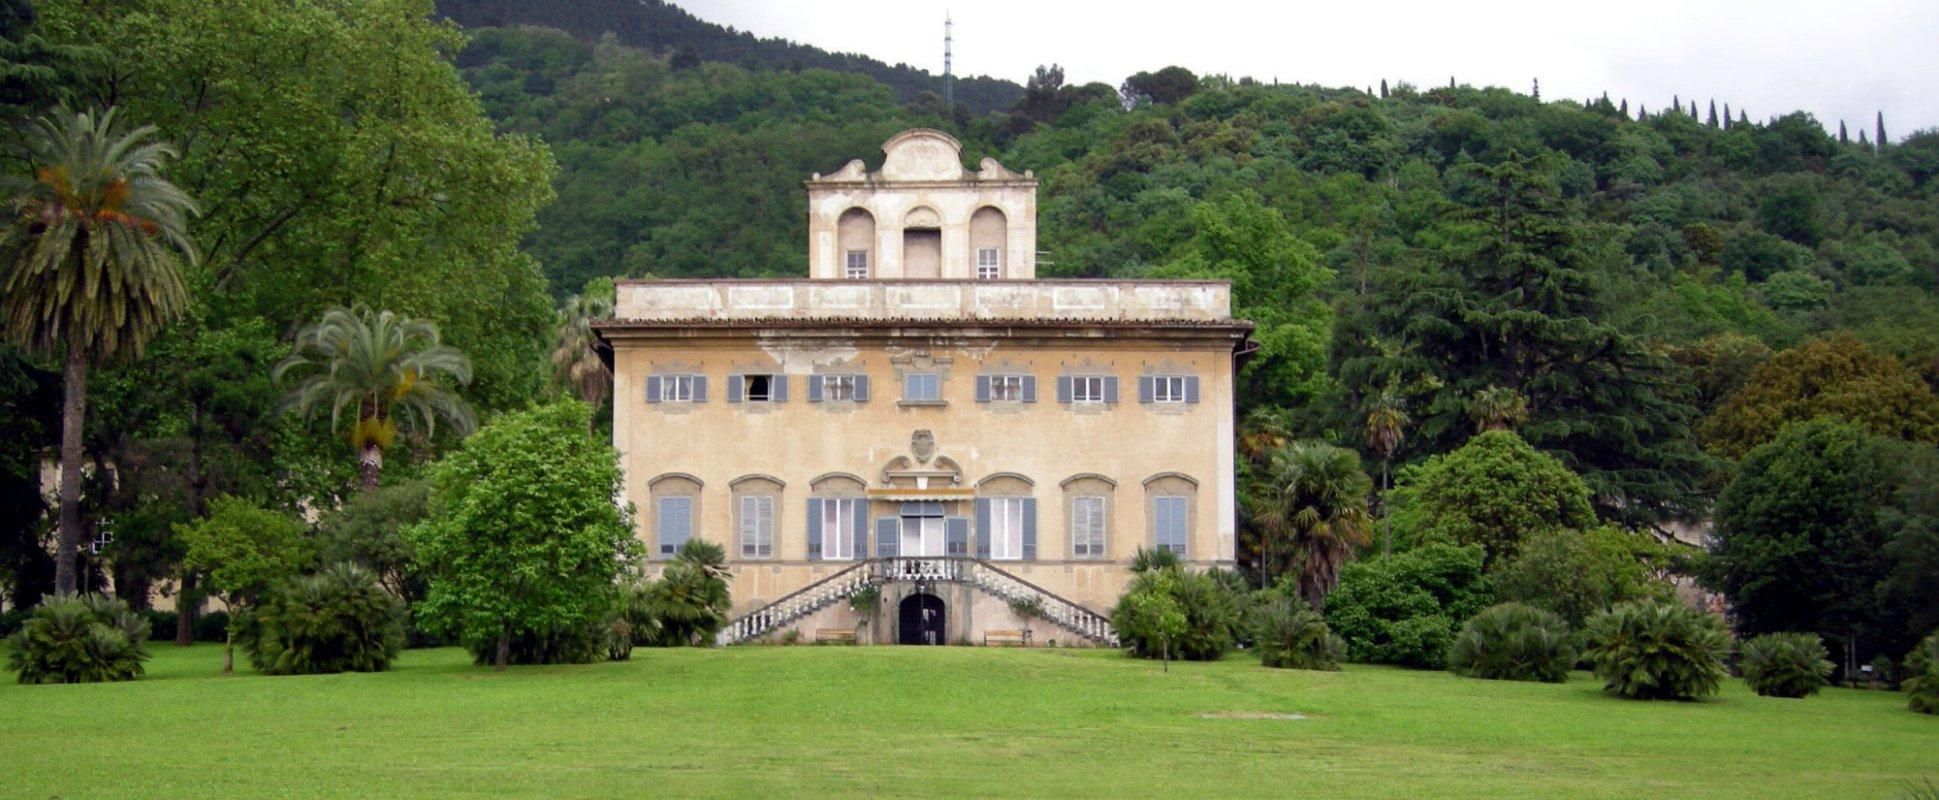 https://www.visittuscany.com/shared/visittuscany/immagini/blogs/idea/22_villa_corliano_san_giuliano_terme.jpg?__scale=w:1939,h:800,t:2,q:85